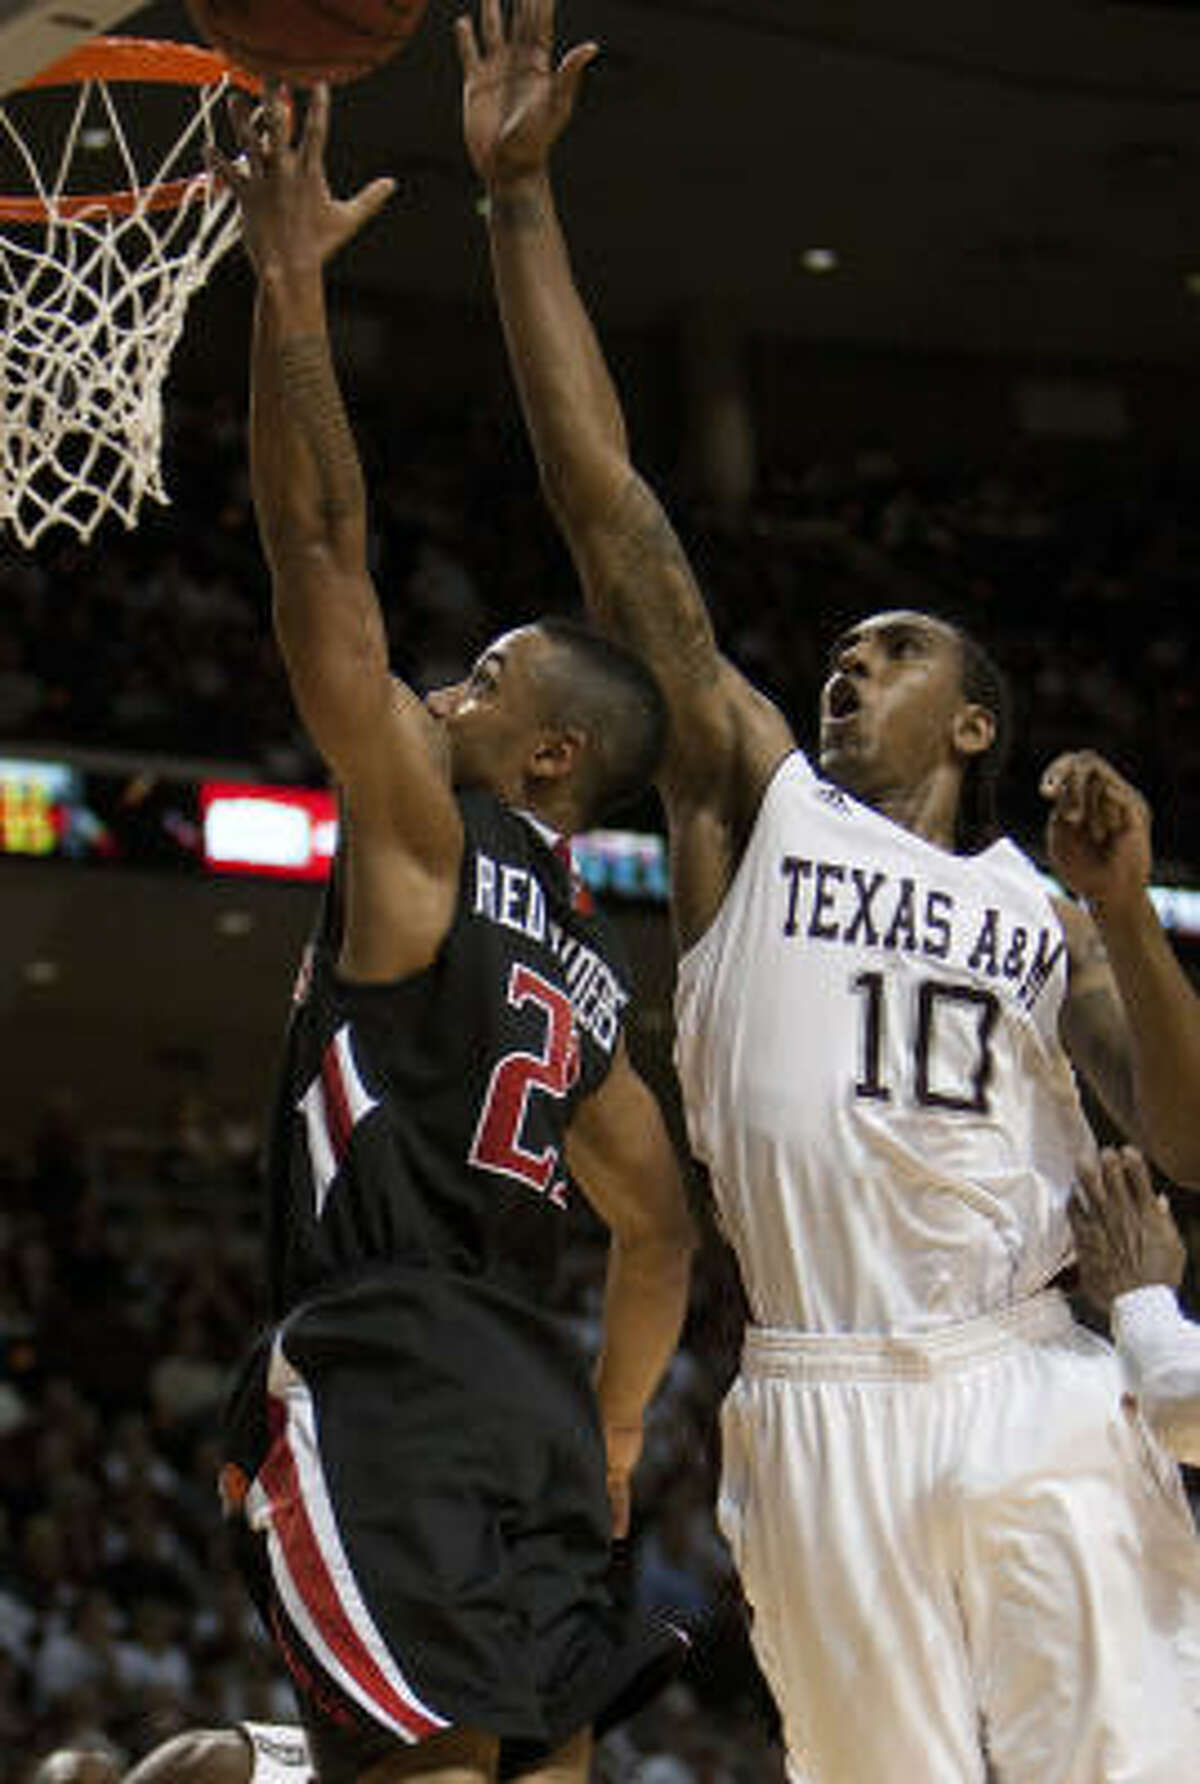 Texas A&M forward David Loubeau scored 21 points Saturday.